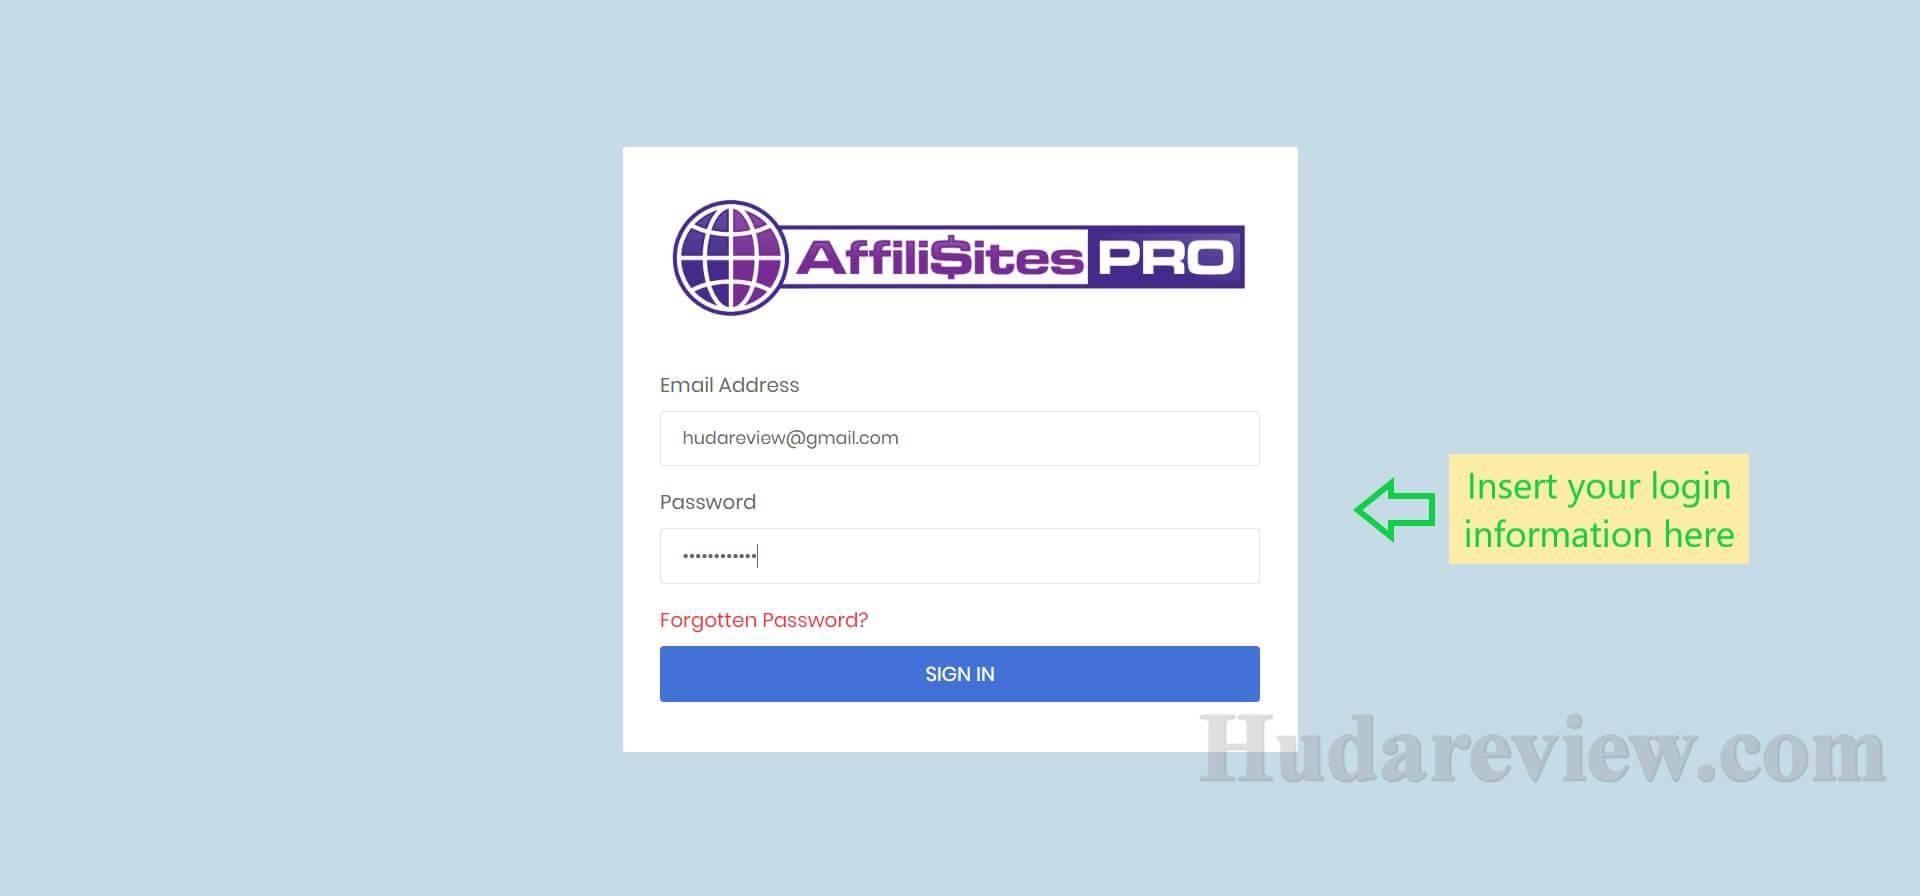 AffiliSites-PRO-Step-1